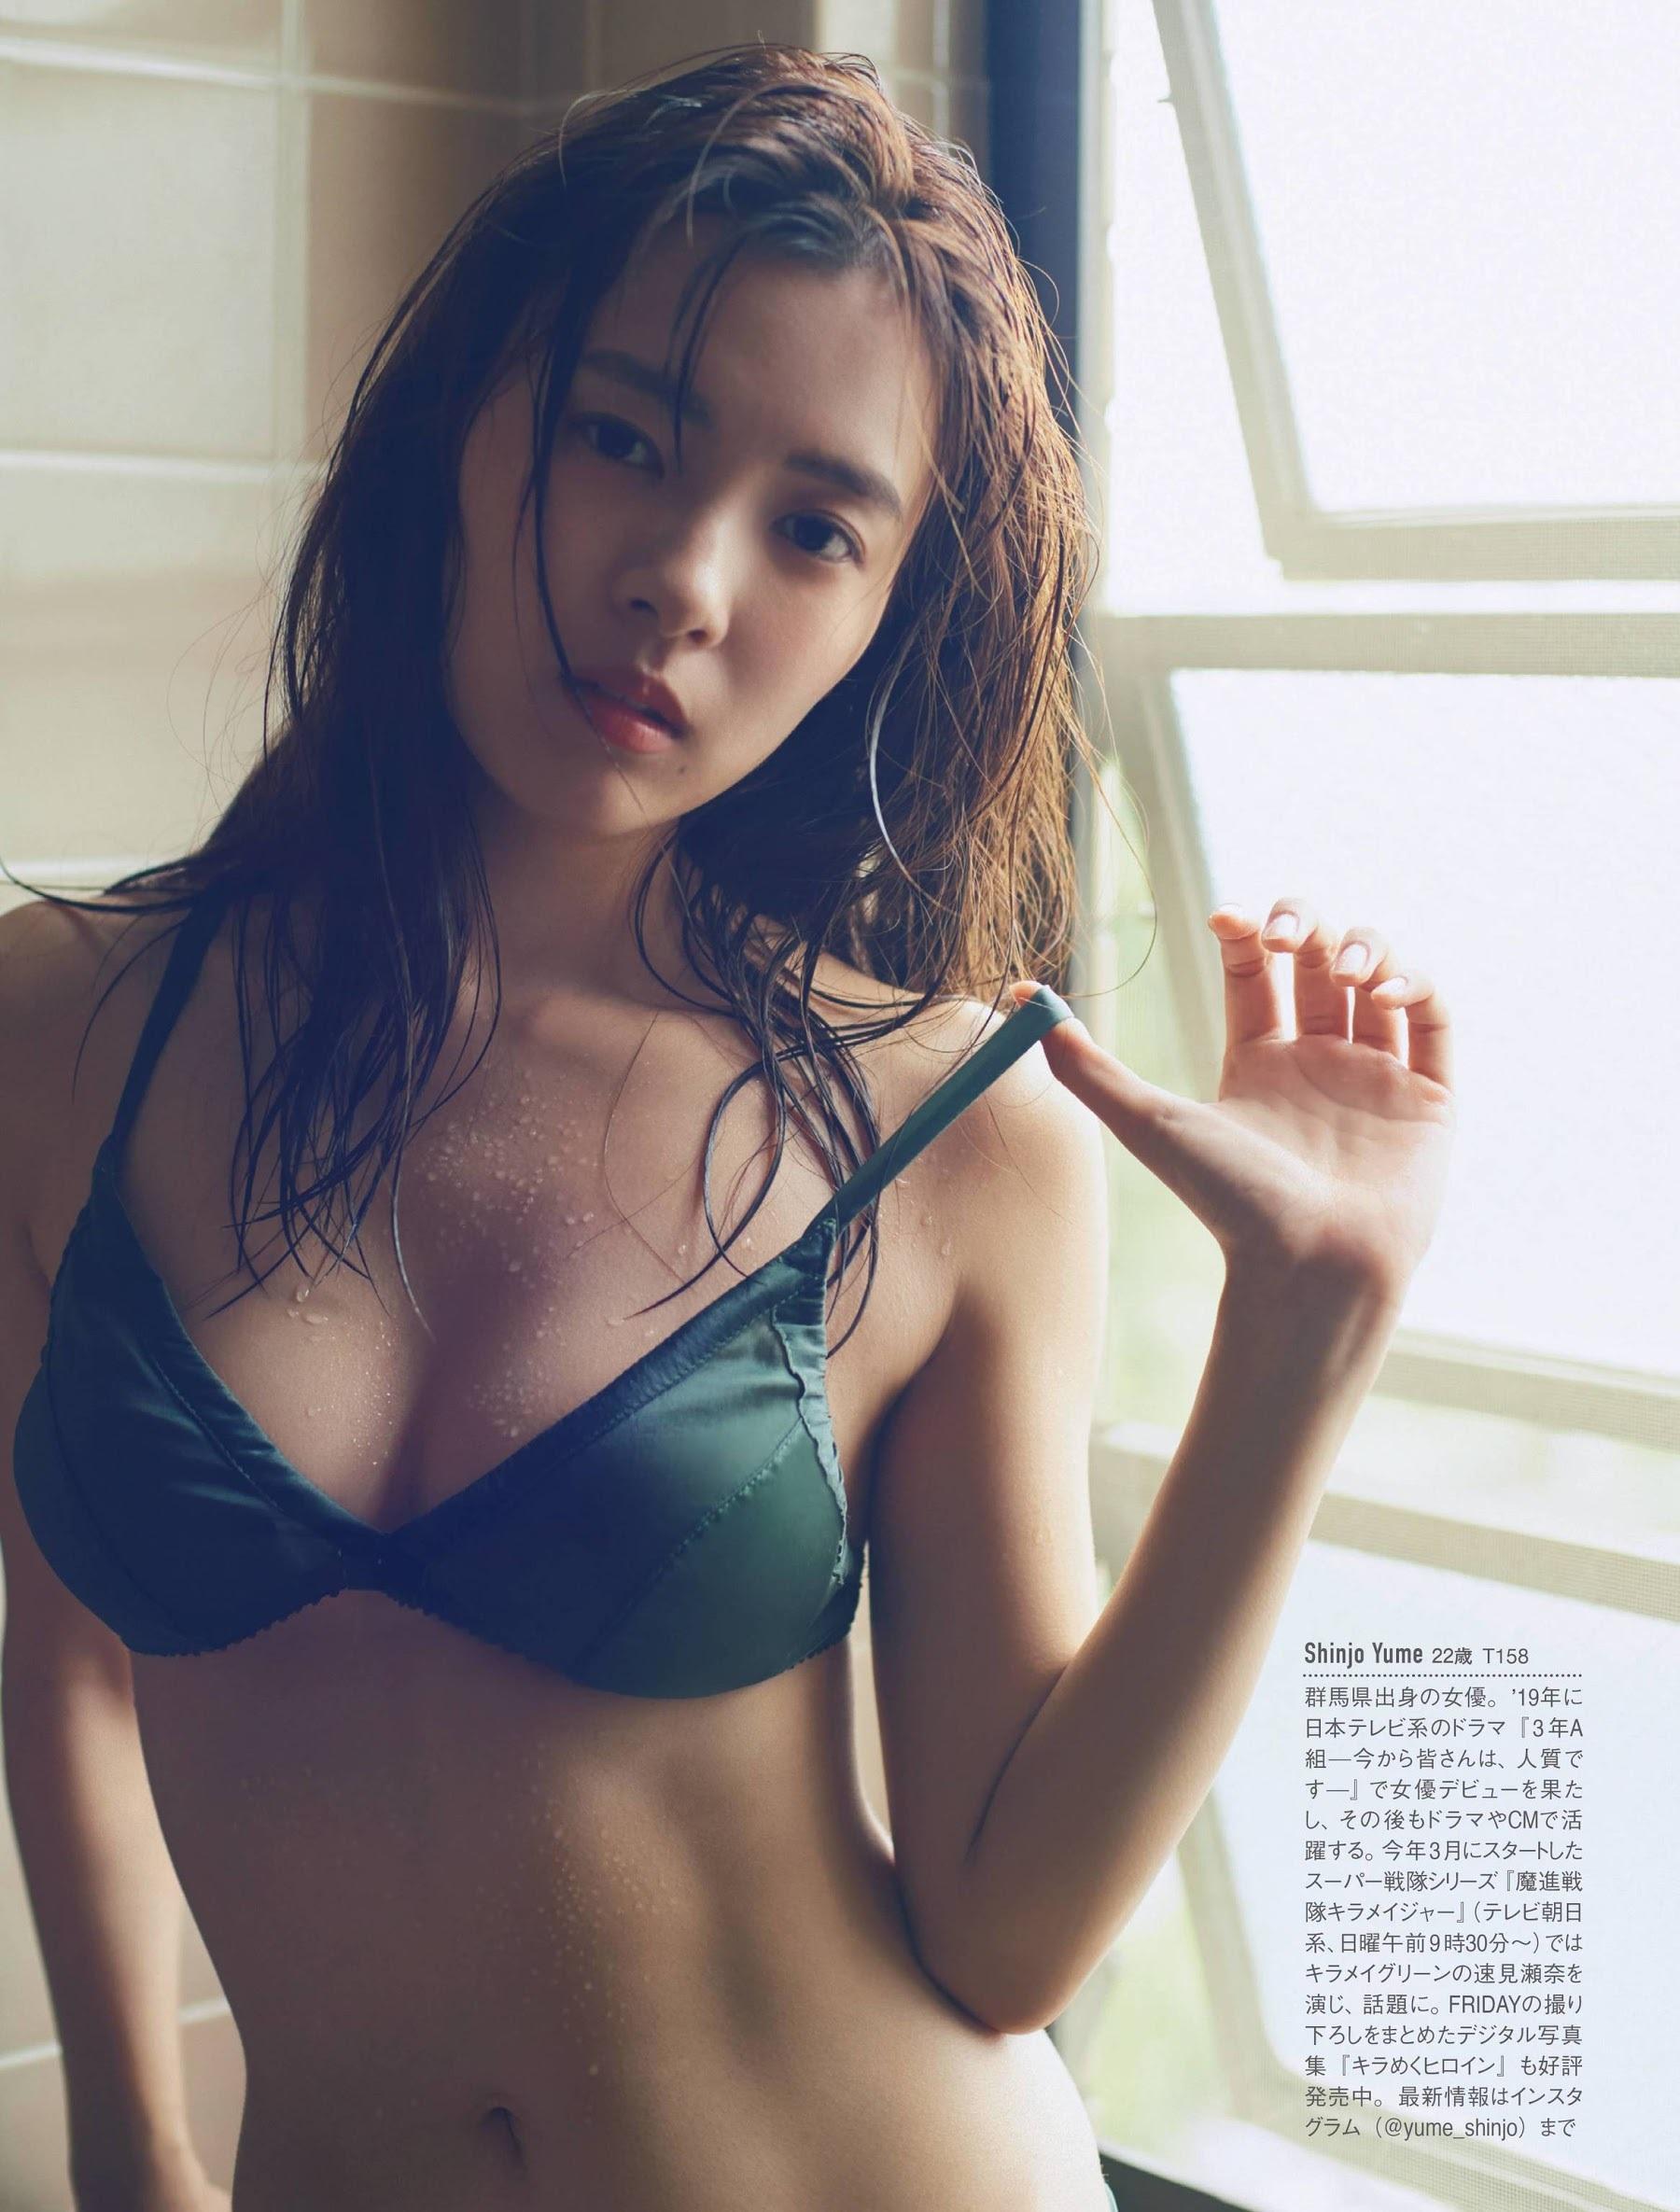 Active Super Sentai Actress Yume Shinjo007